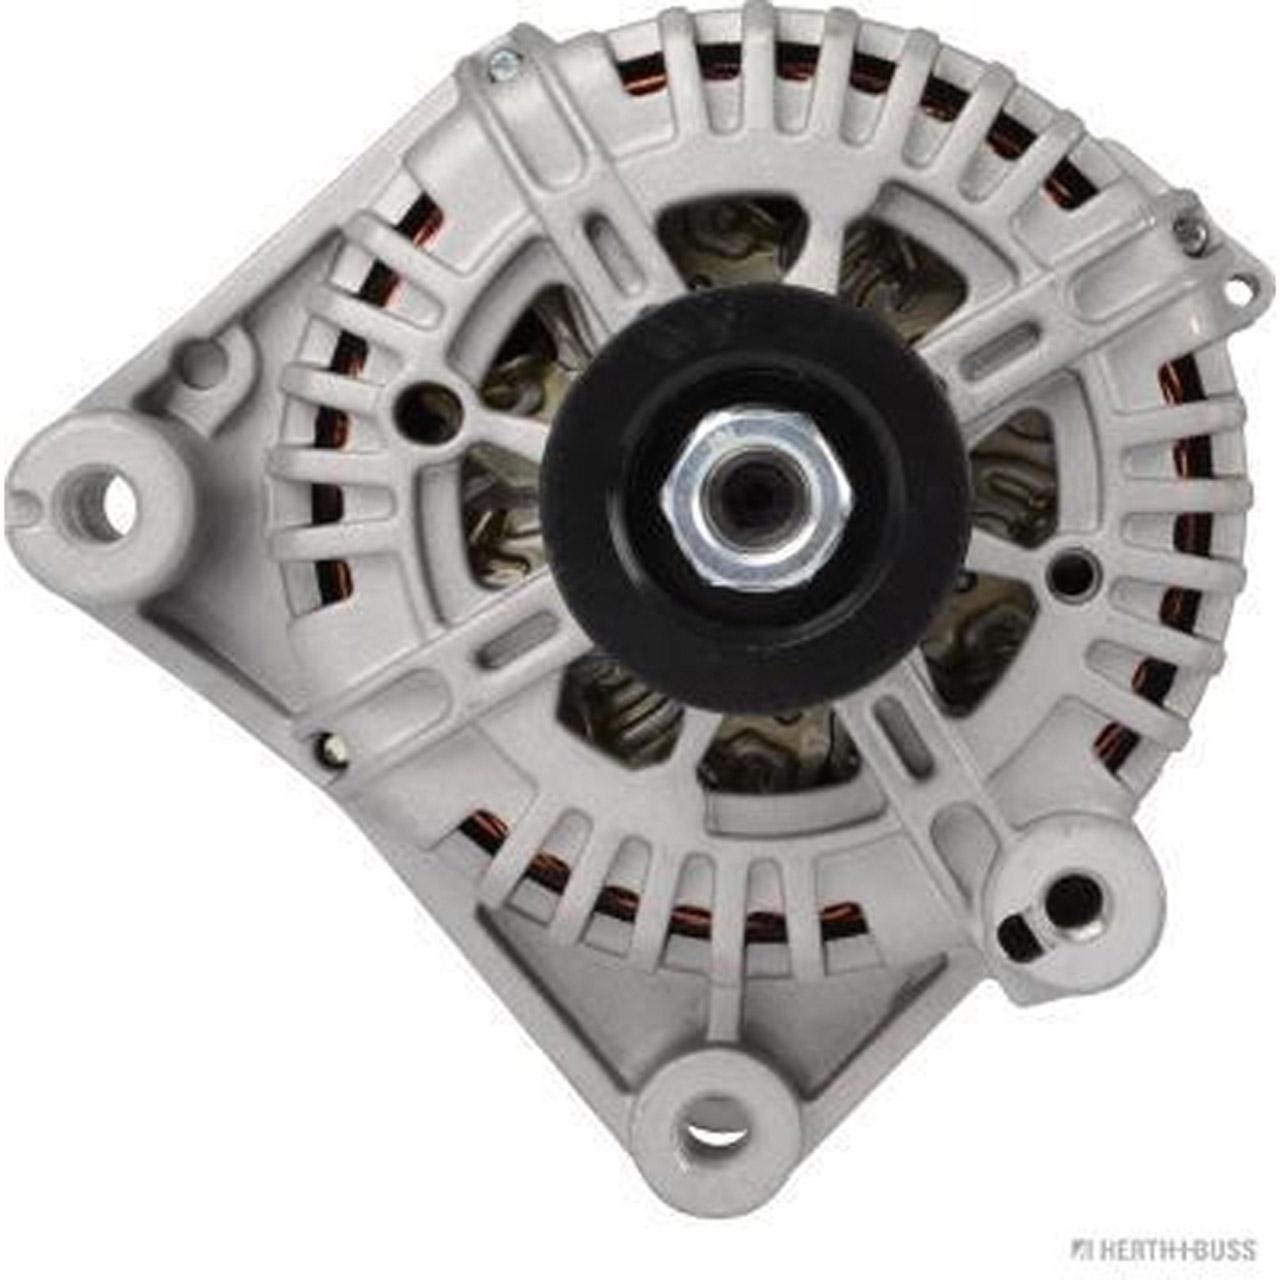 HERTH+BUSS Lichtmaschine 14V 150A MINI R55-61 One D / Cooper D / Cooper SD